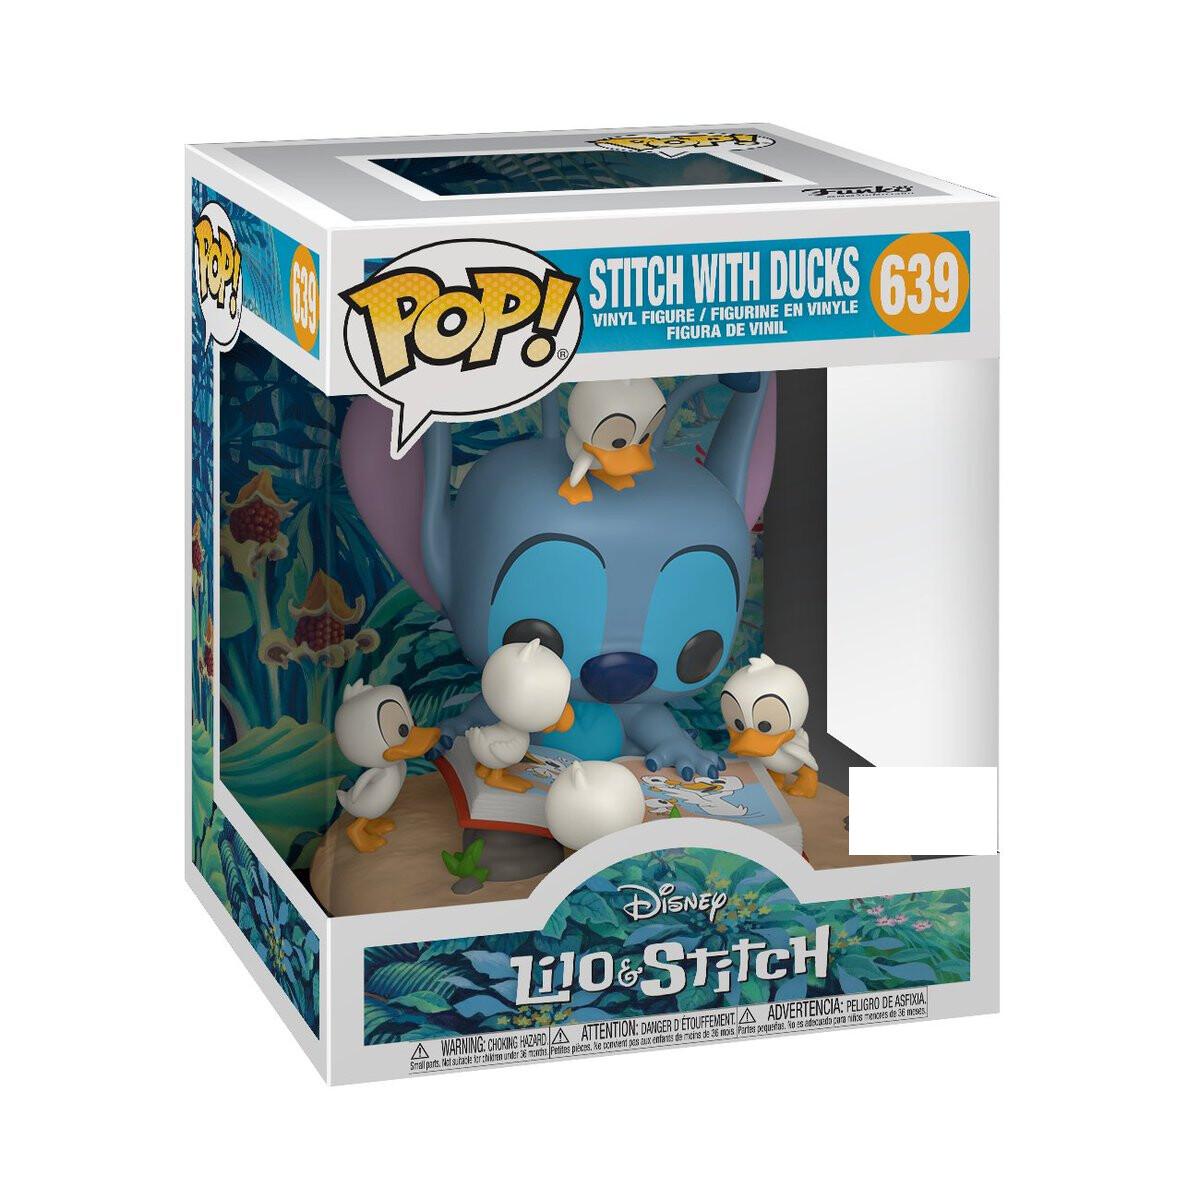 Lilo & Stitch - Stitch with Book & Ducks Pop! Deluxe Vinyl Figure